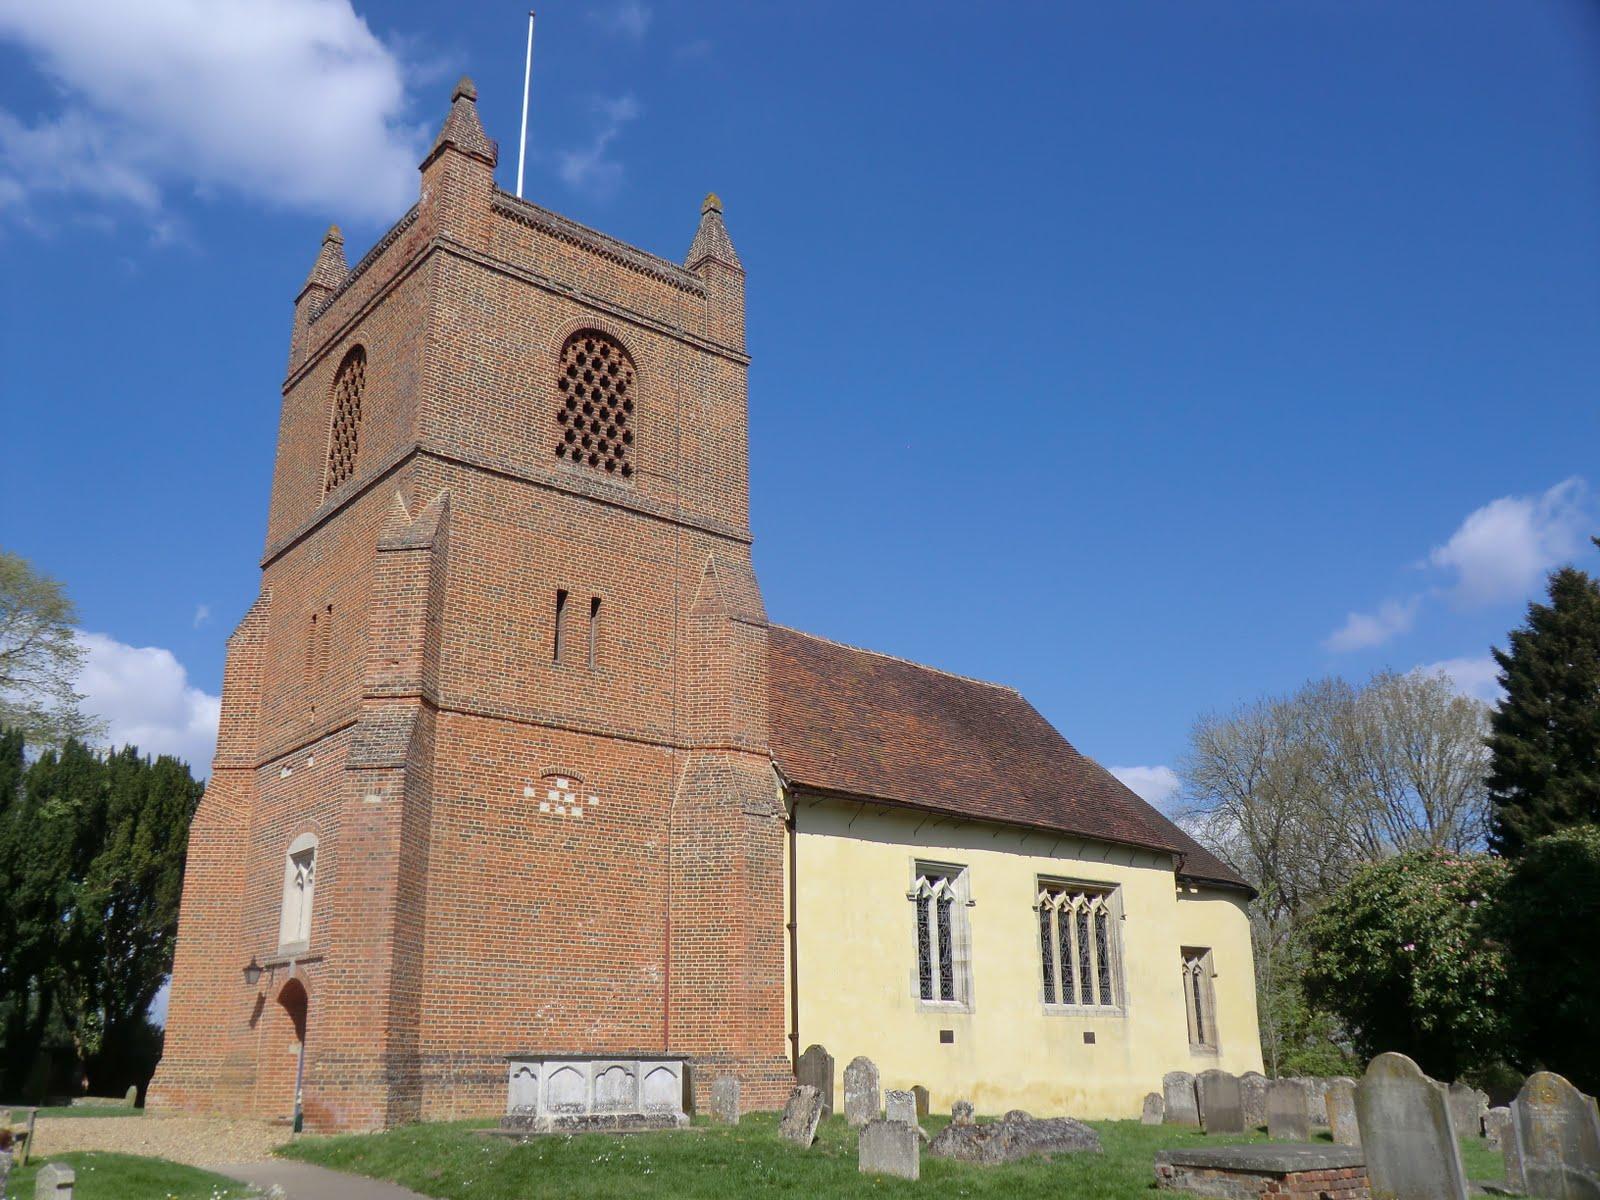 CIMG0459 St James' church, Finchampstead